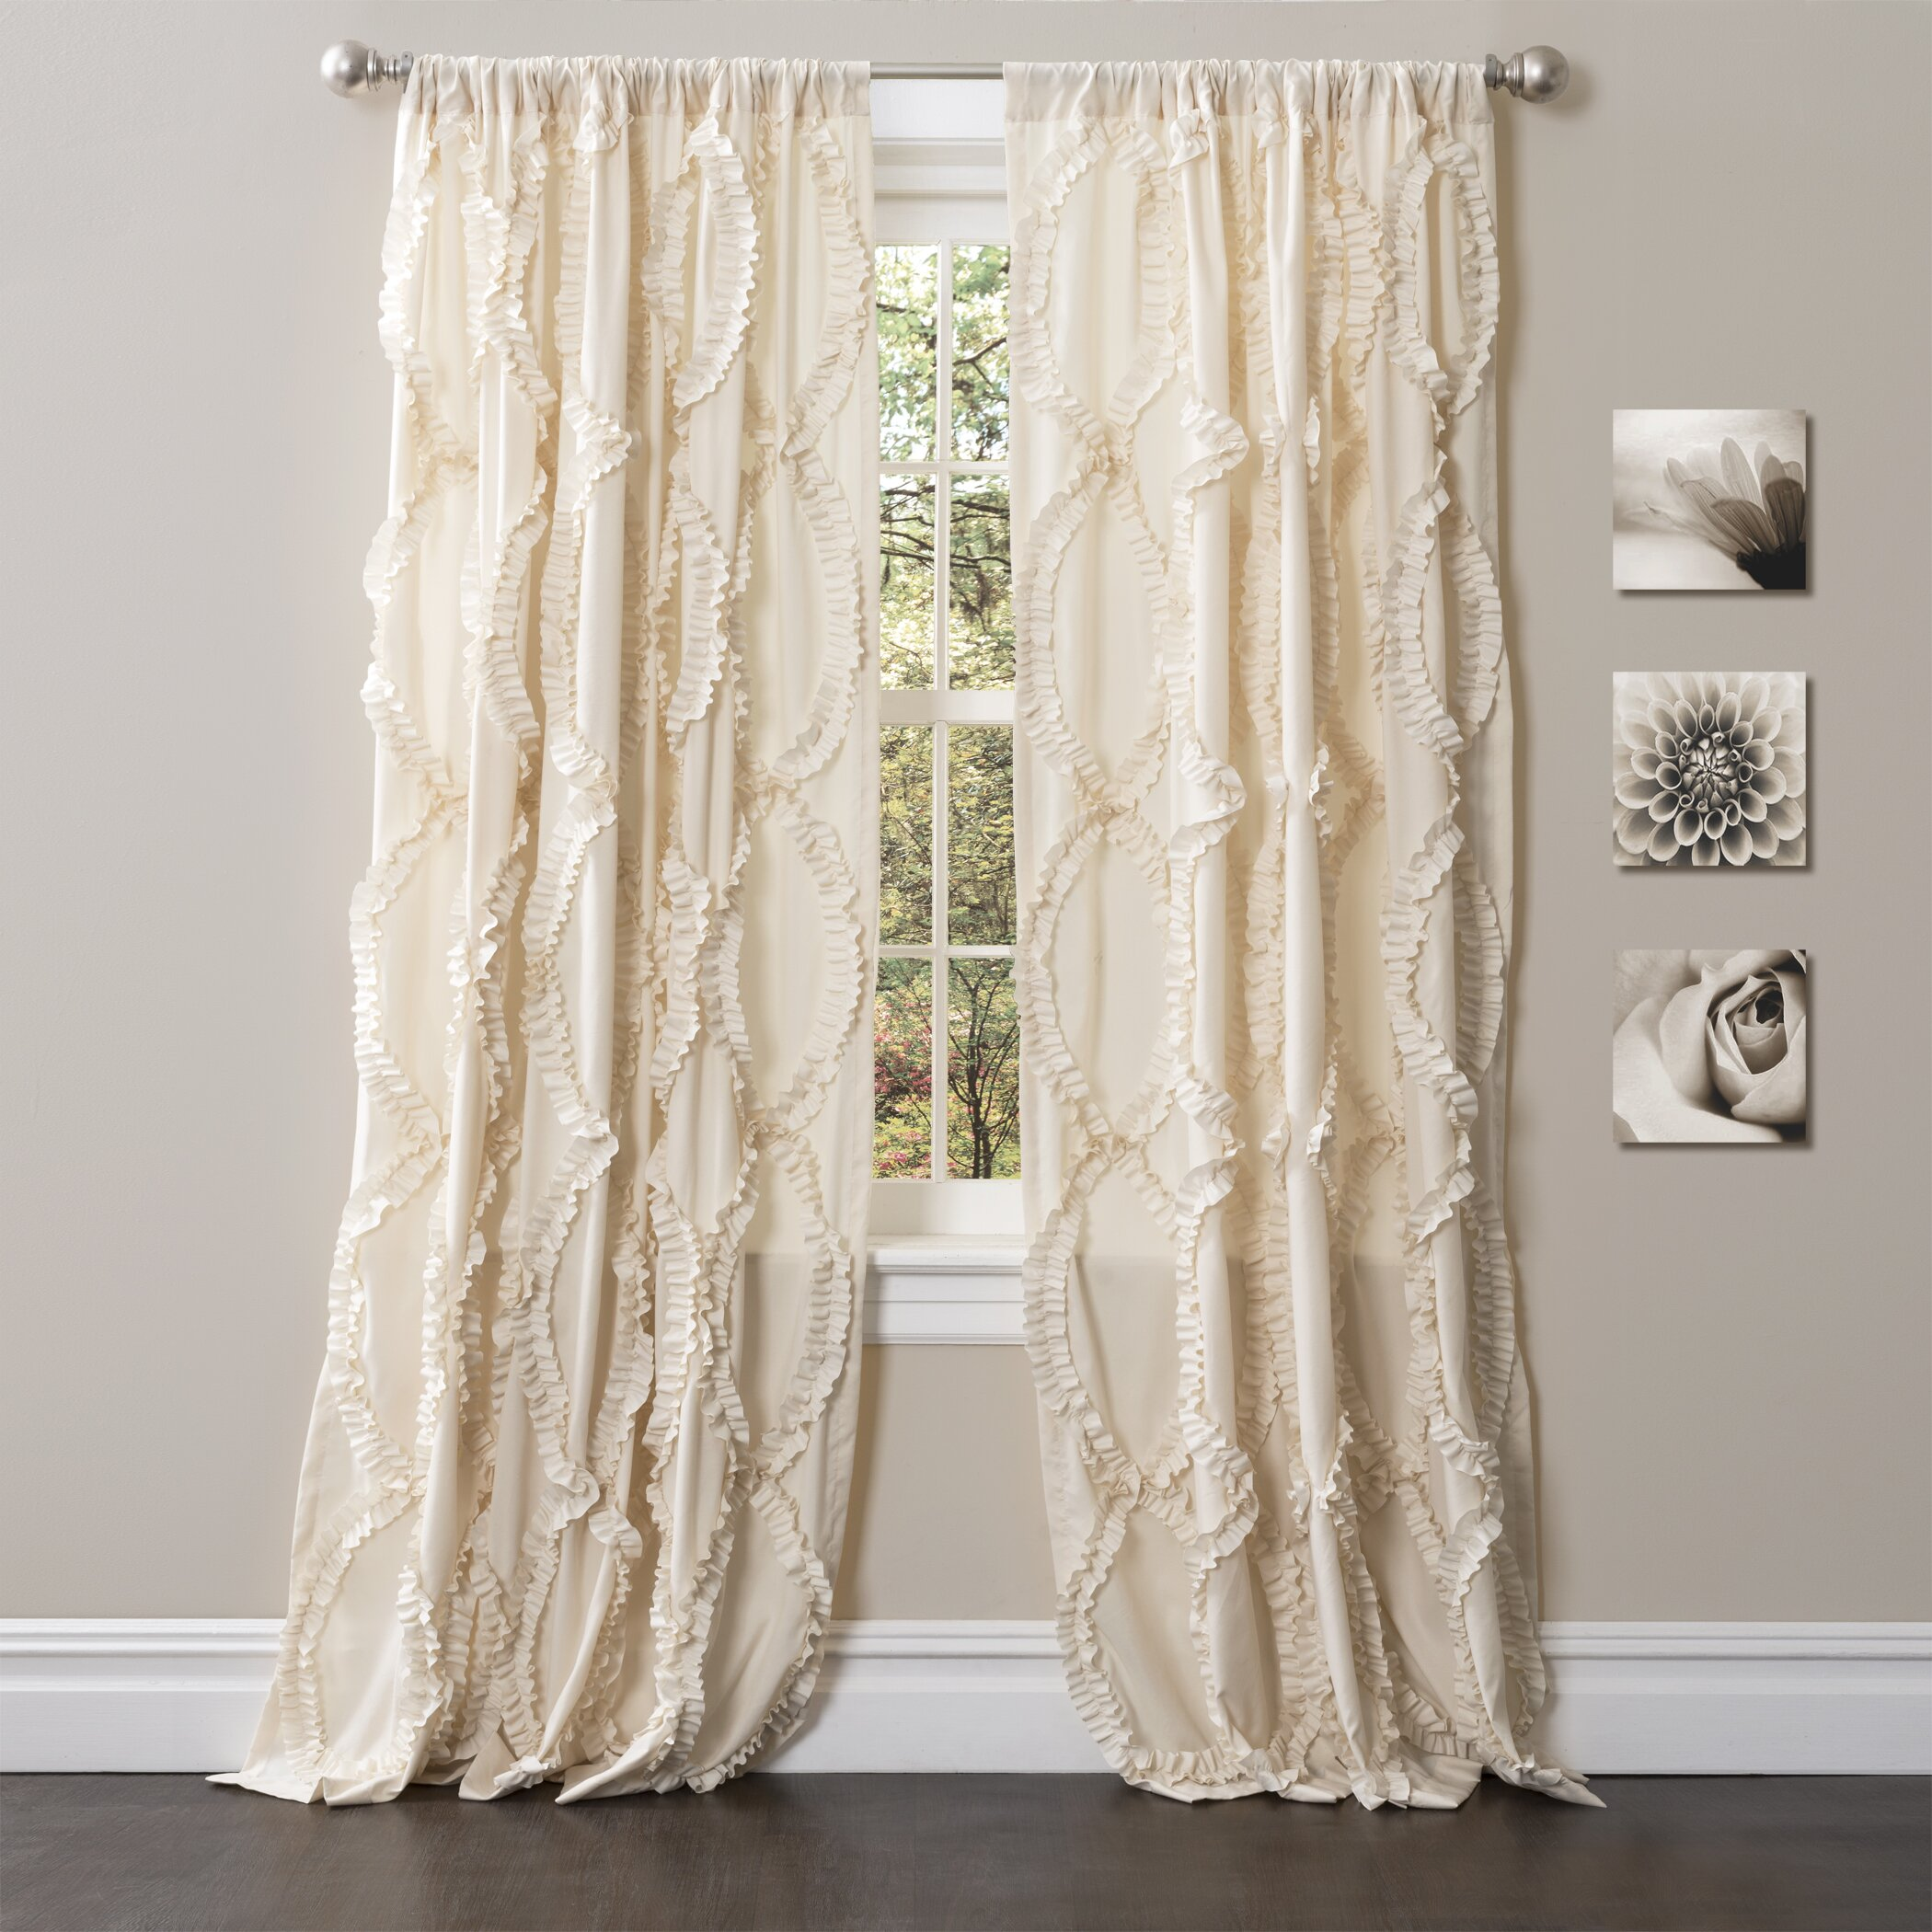 Lush Decor Avon Light filtering Window Single Curtain